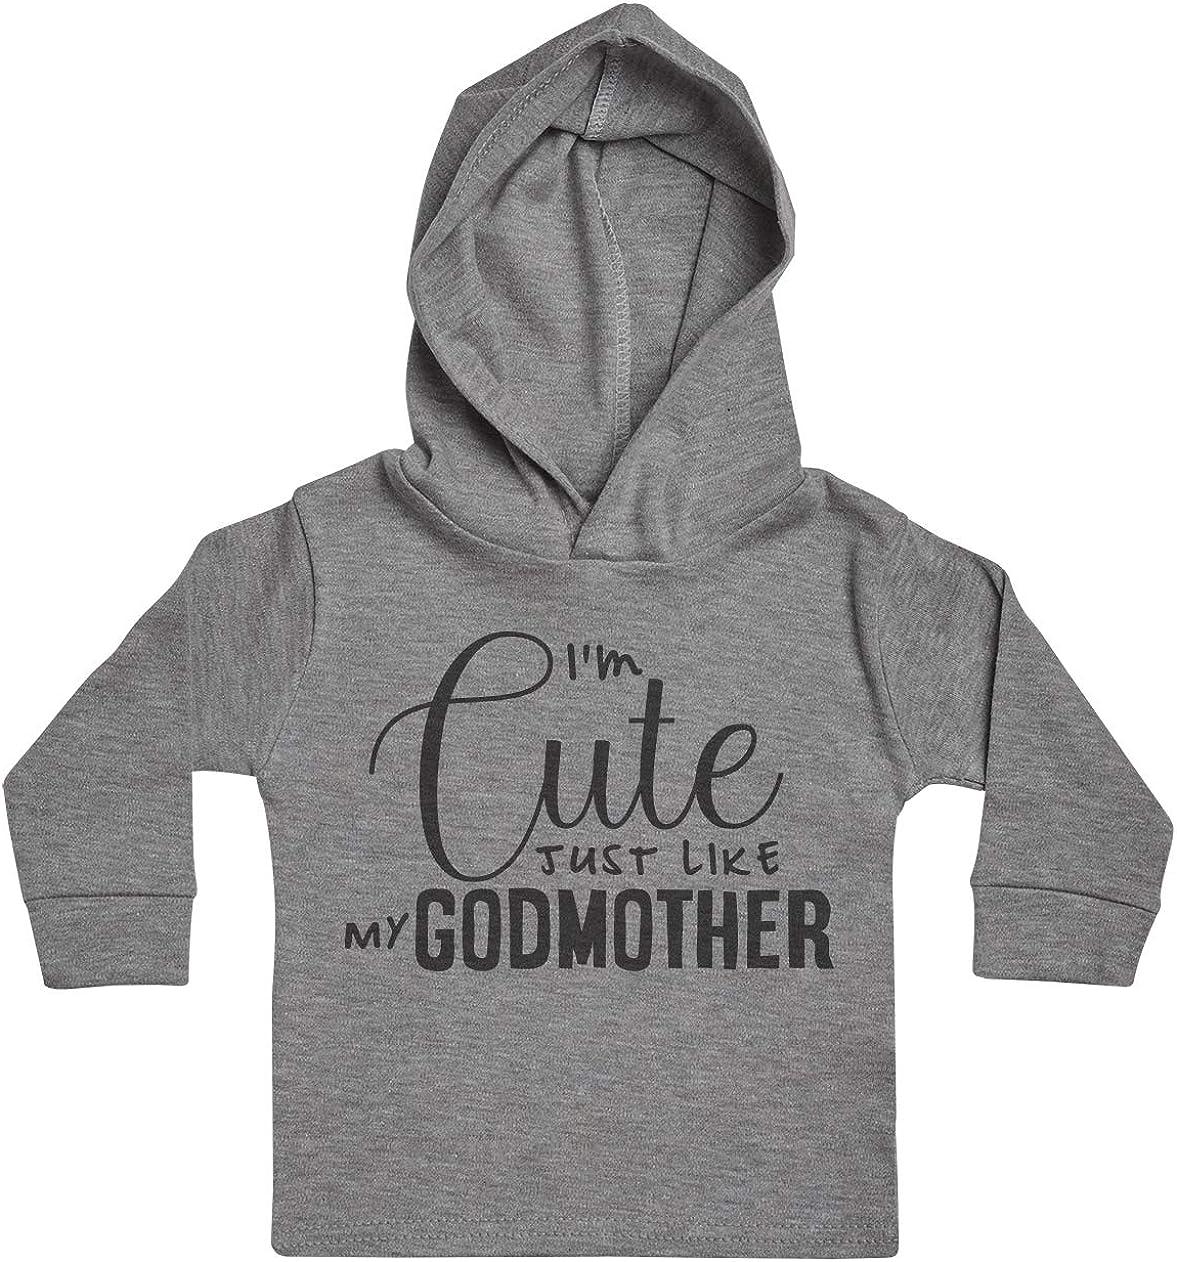 Baby Girl Hoody Im Cute Just Like My Godmother Baby Boy Hoody Baby Gift Baby Clothing Baby Hoody